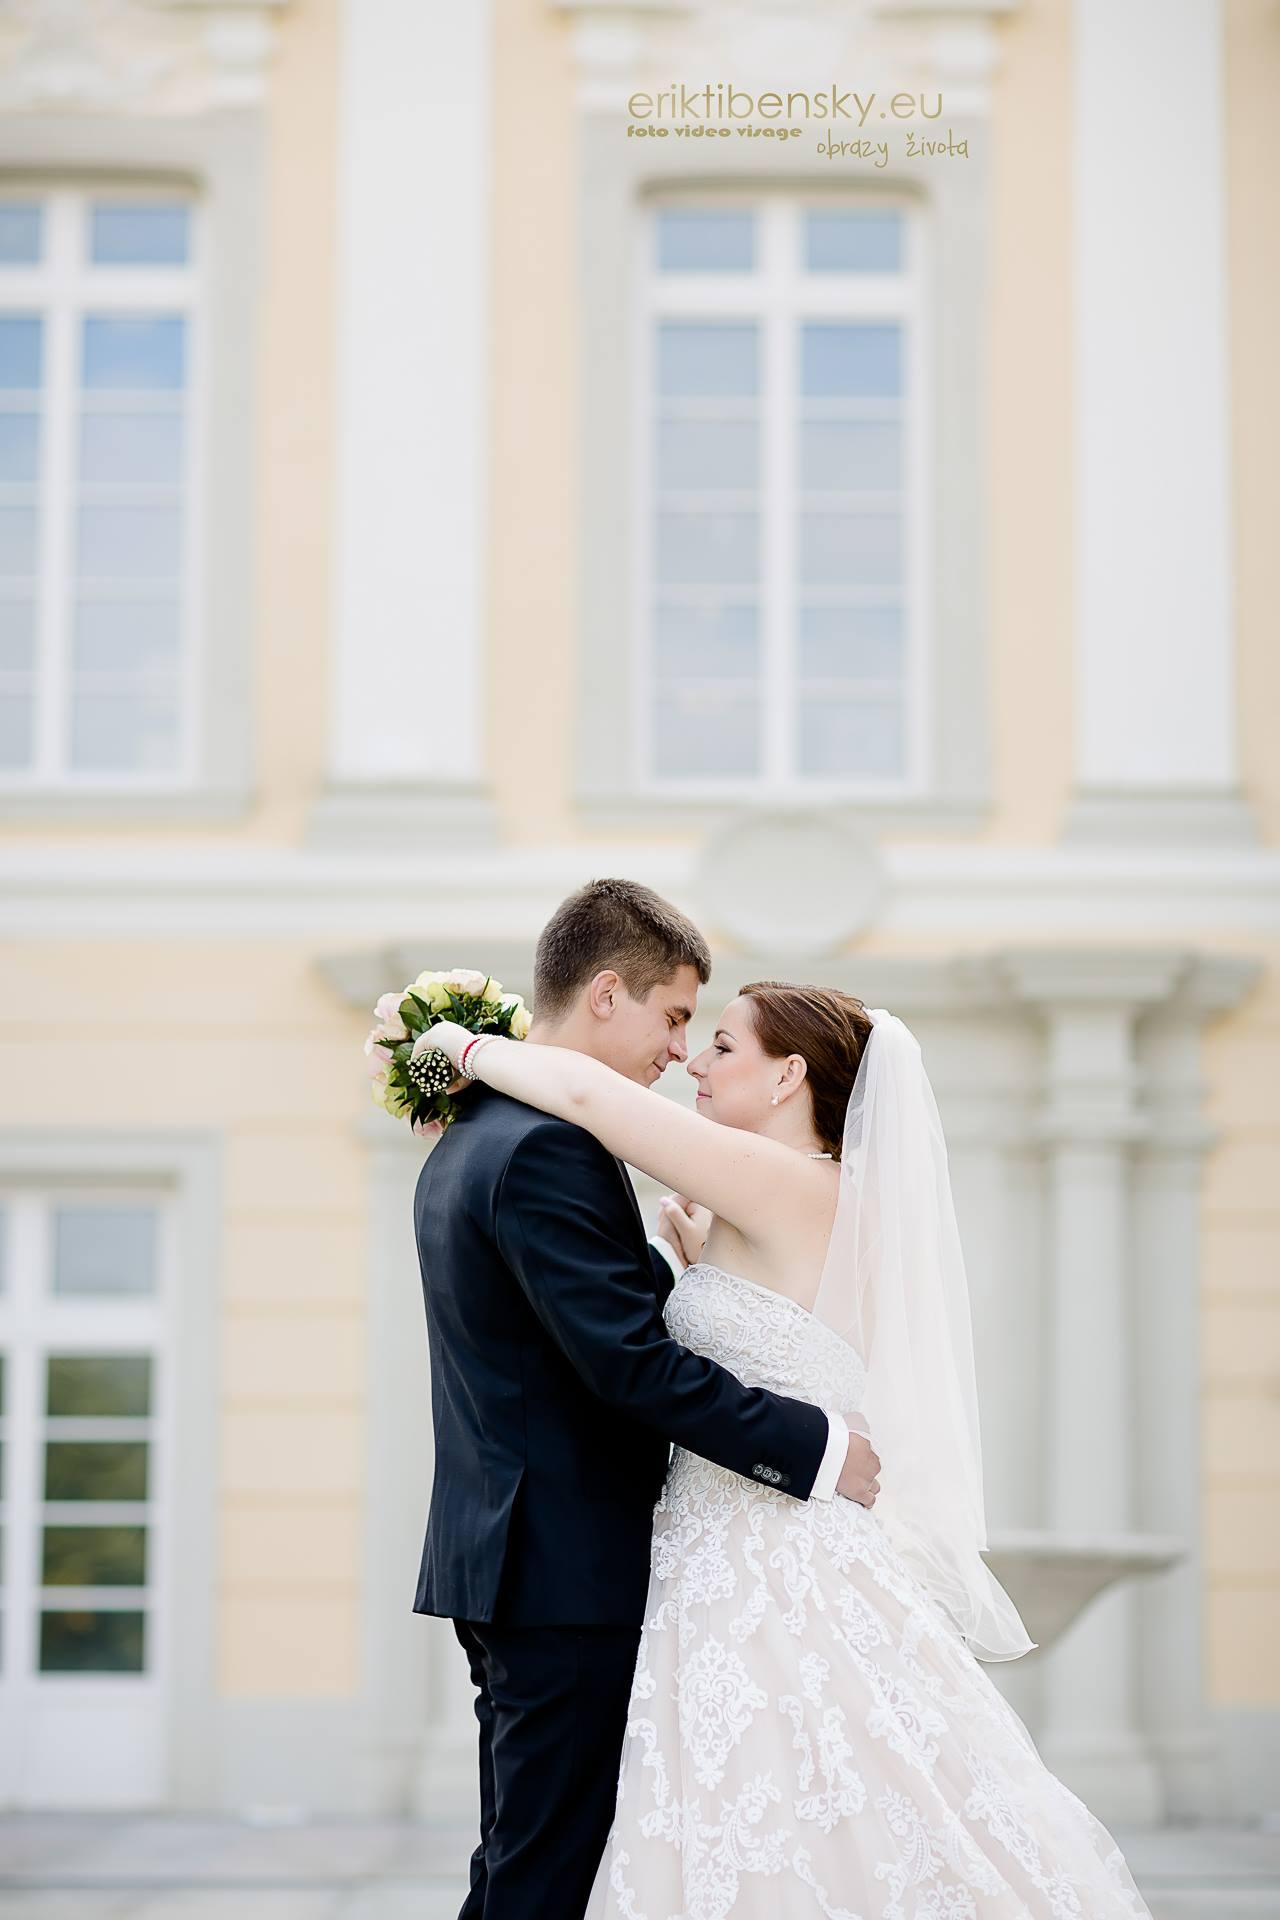 eriktibensky-eu-svadobny-fotograf-wedding-photographer-3072